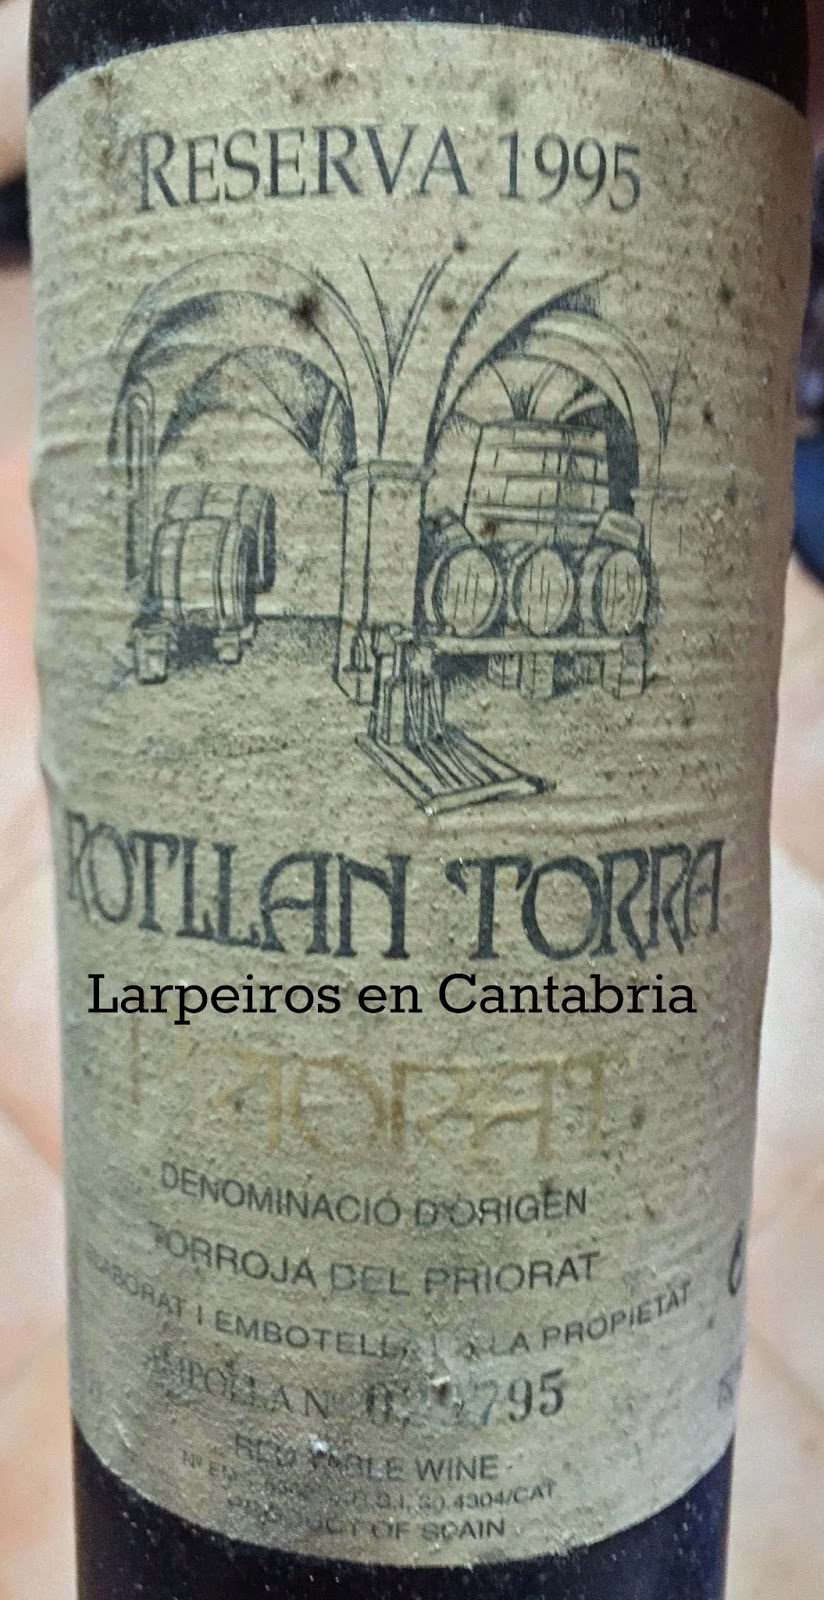 Vino Tinto Rotllan Torra Reserva 1995: Qué Recuerdos